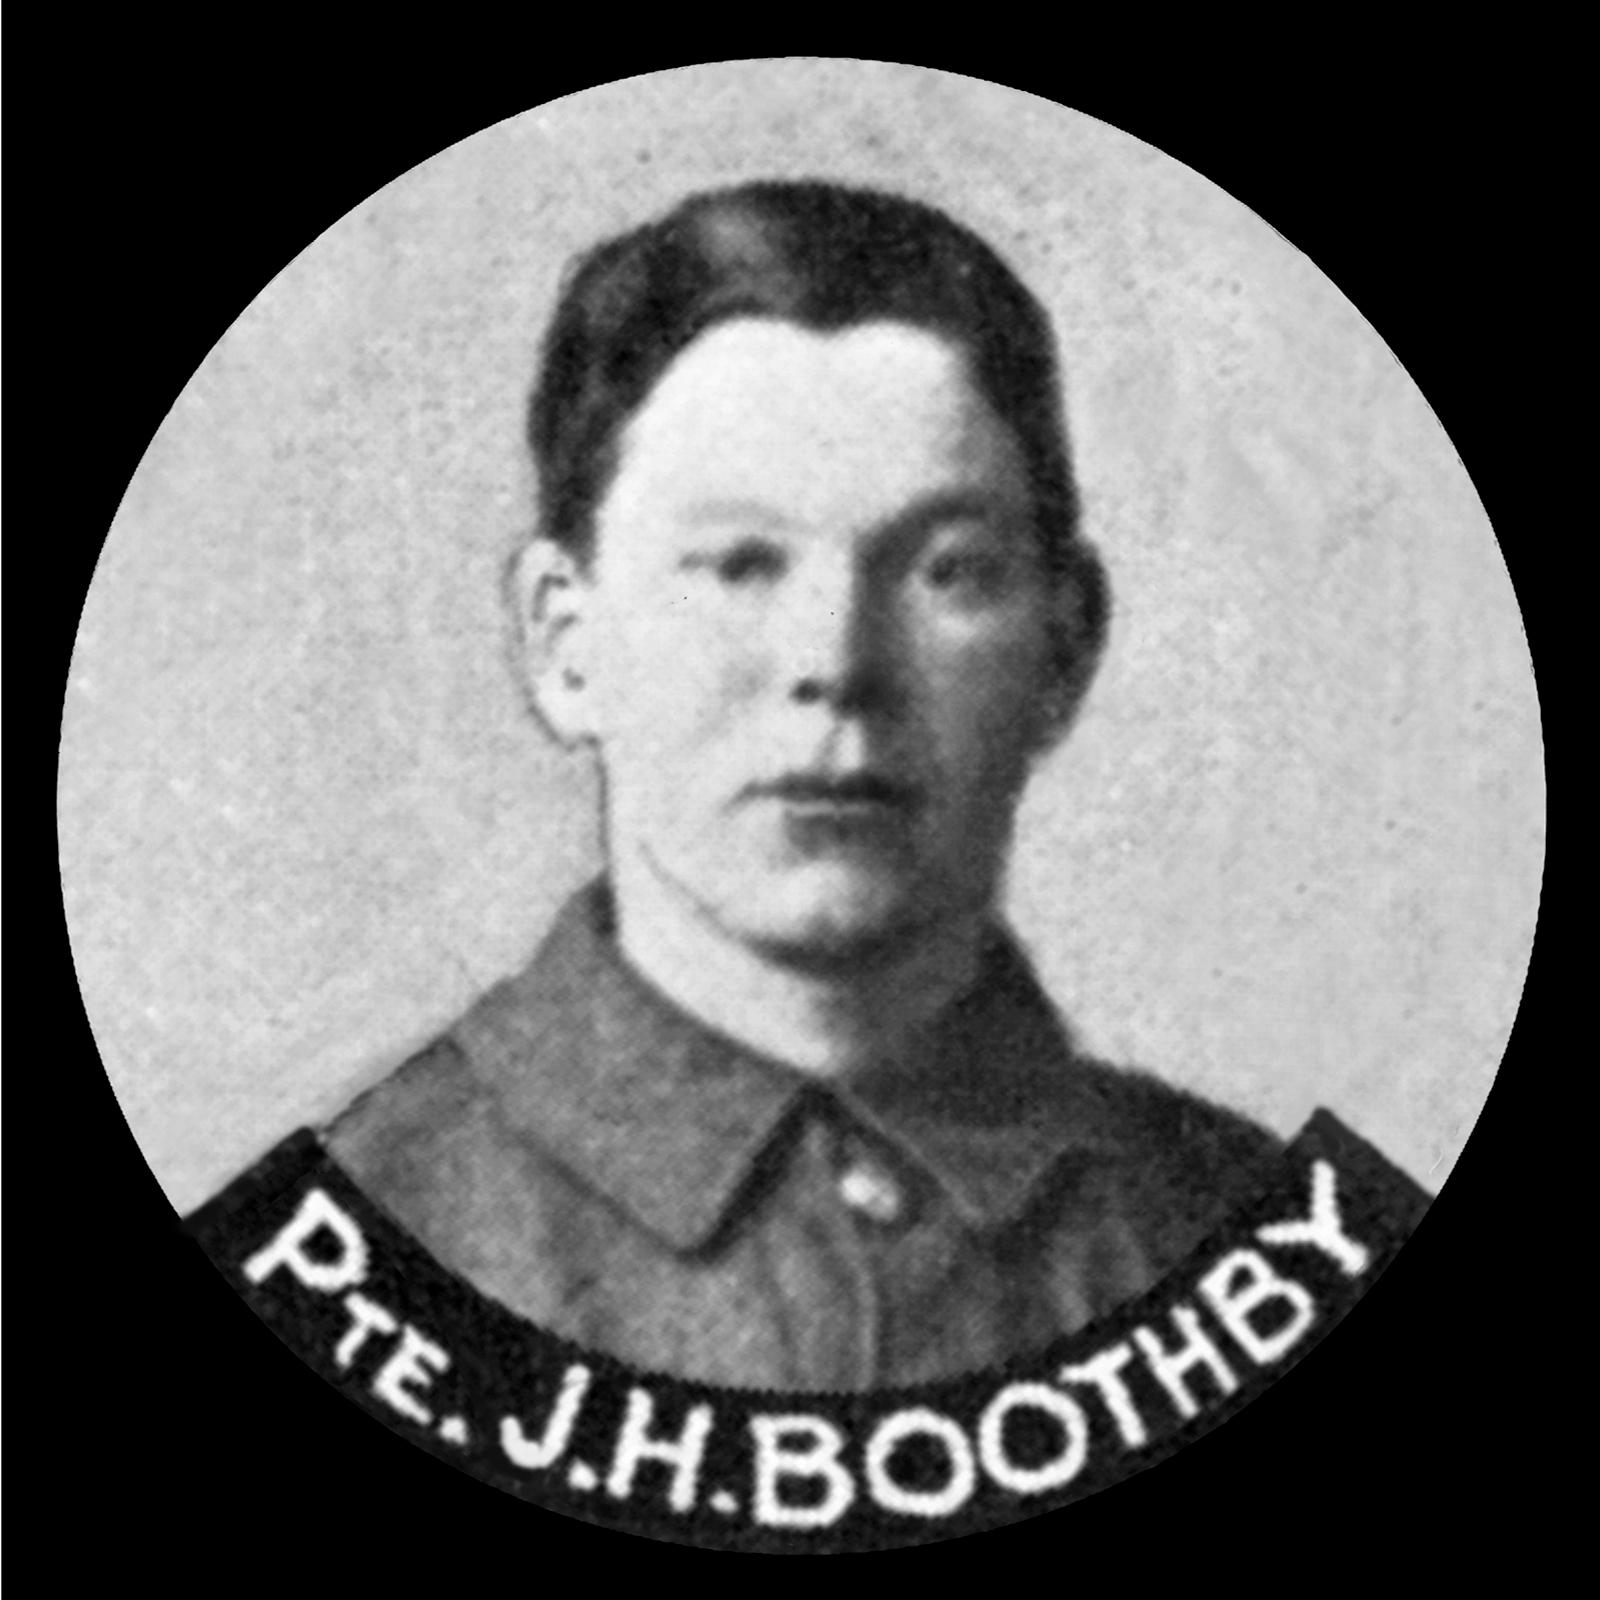 BOOTHBY Joseph Henry